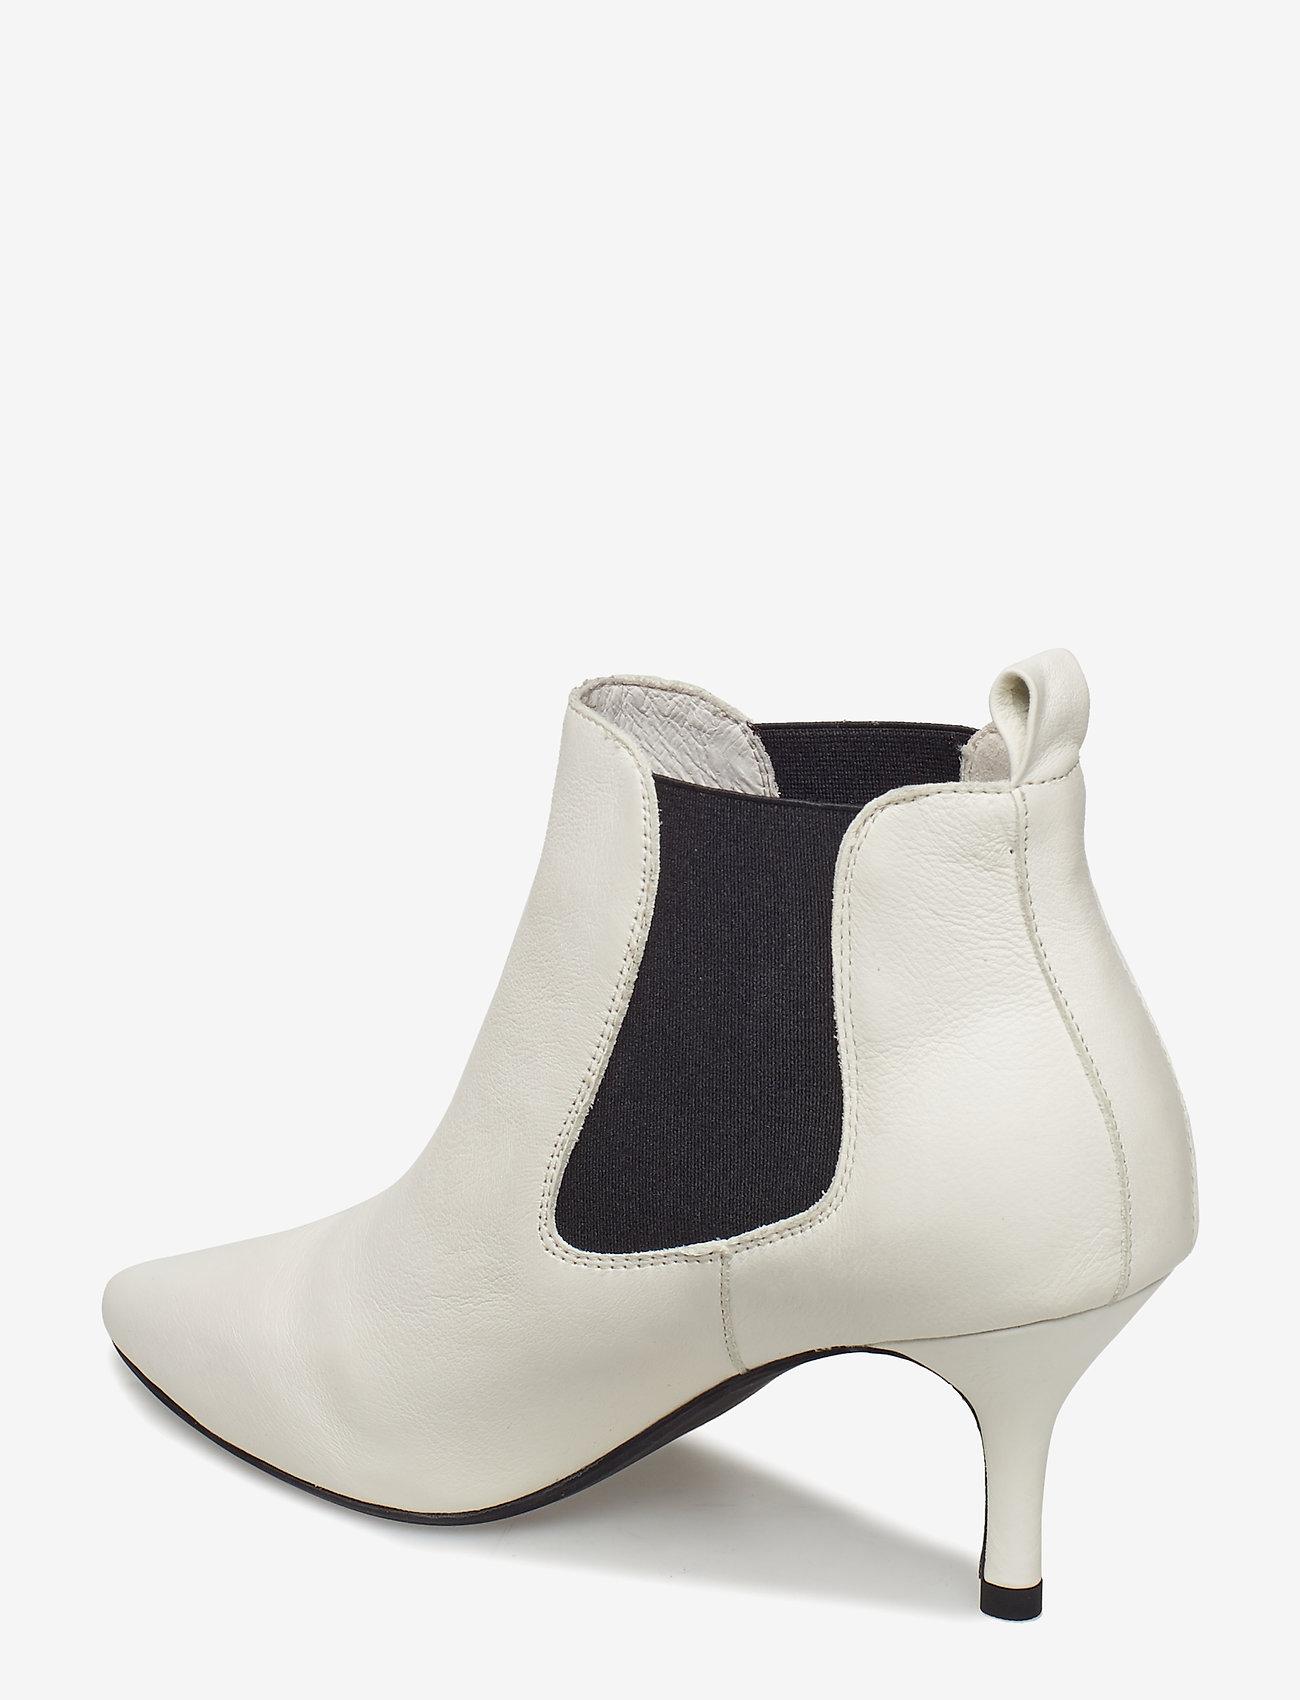 Agnete Chelsea L (White) - Shoe The Bear